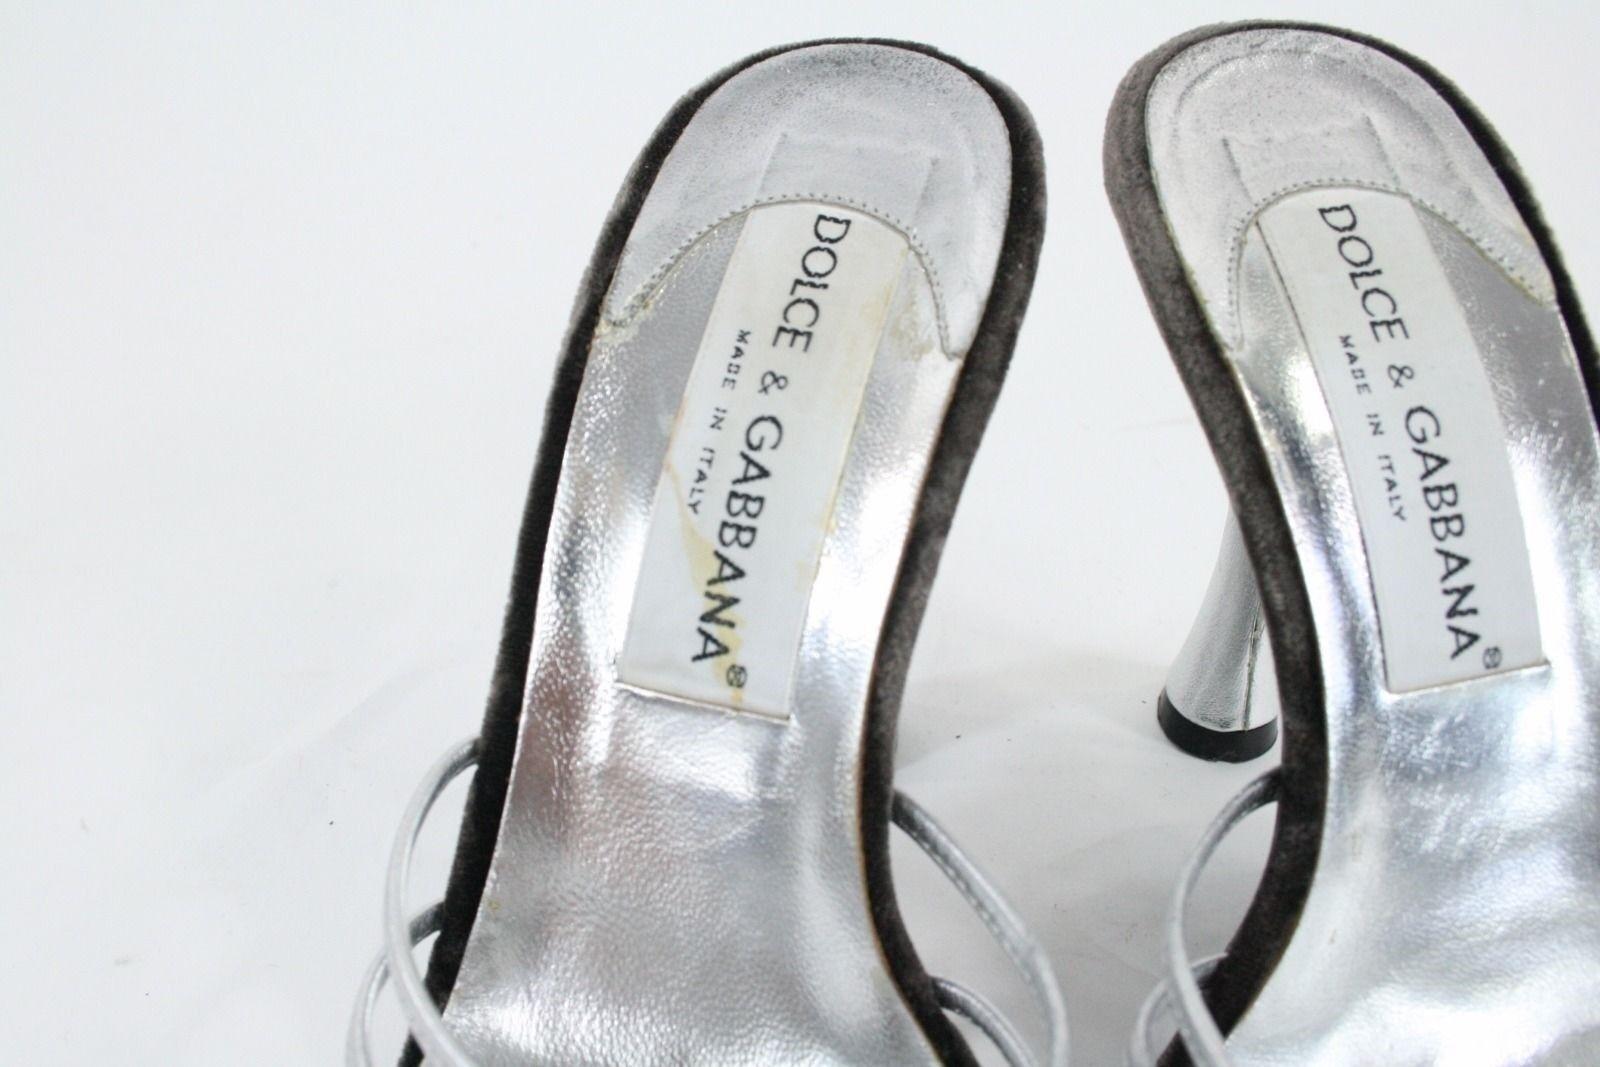 Dolce & Stiletto Gabbanna Silver Leder Strappy Front Backless Stiletto & Sandales Sz 35.5 c9b149